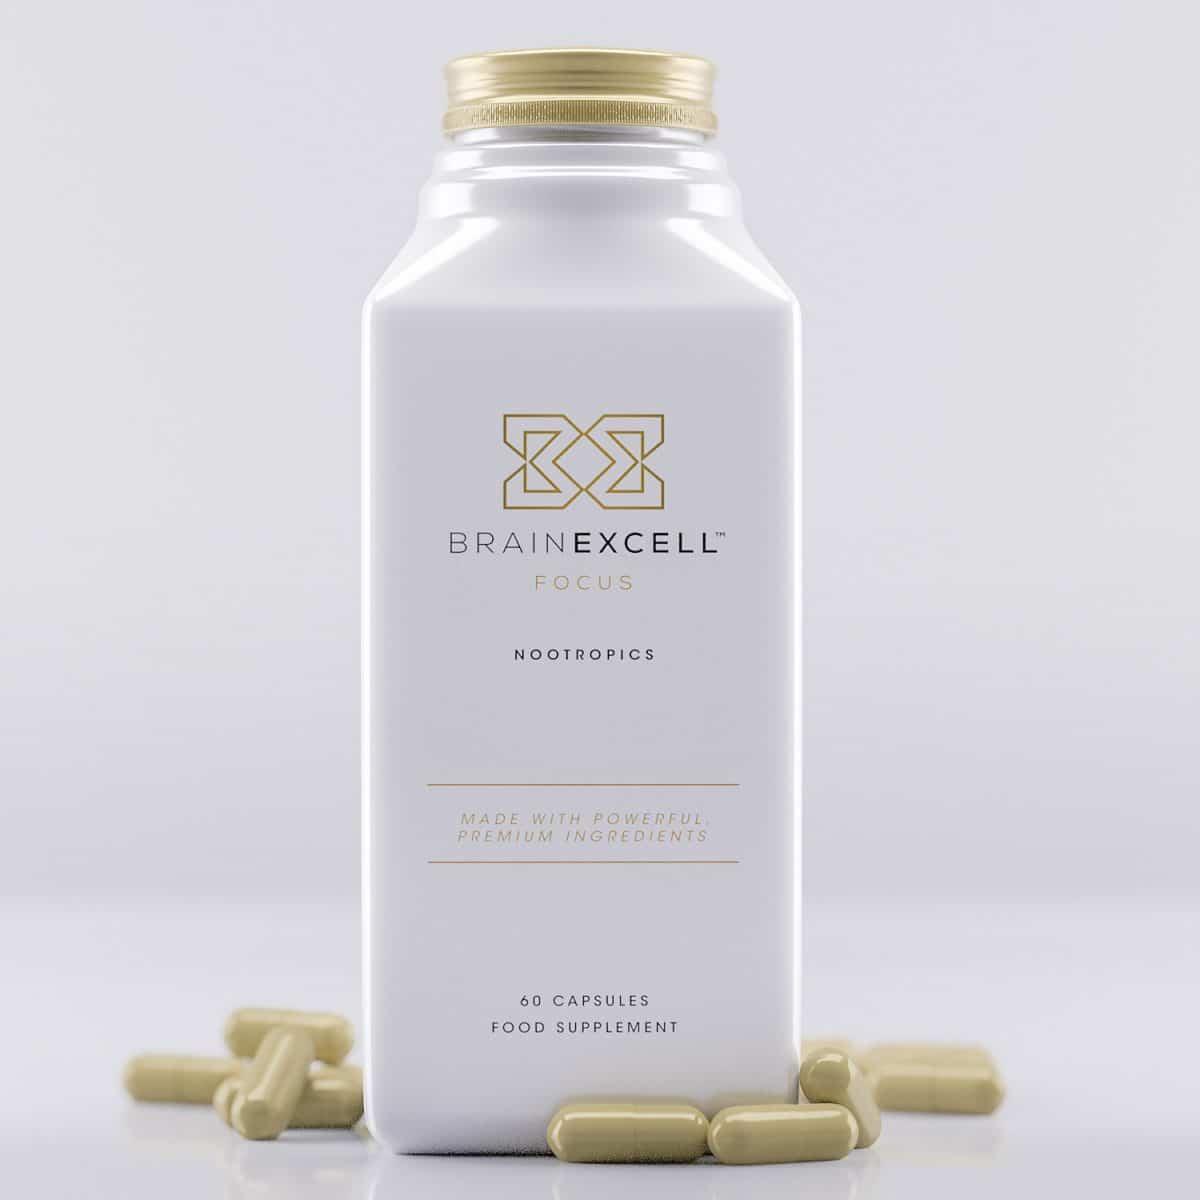 brainexcell Logo & Brand Identity Design